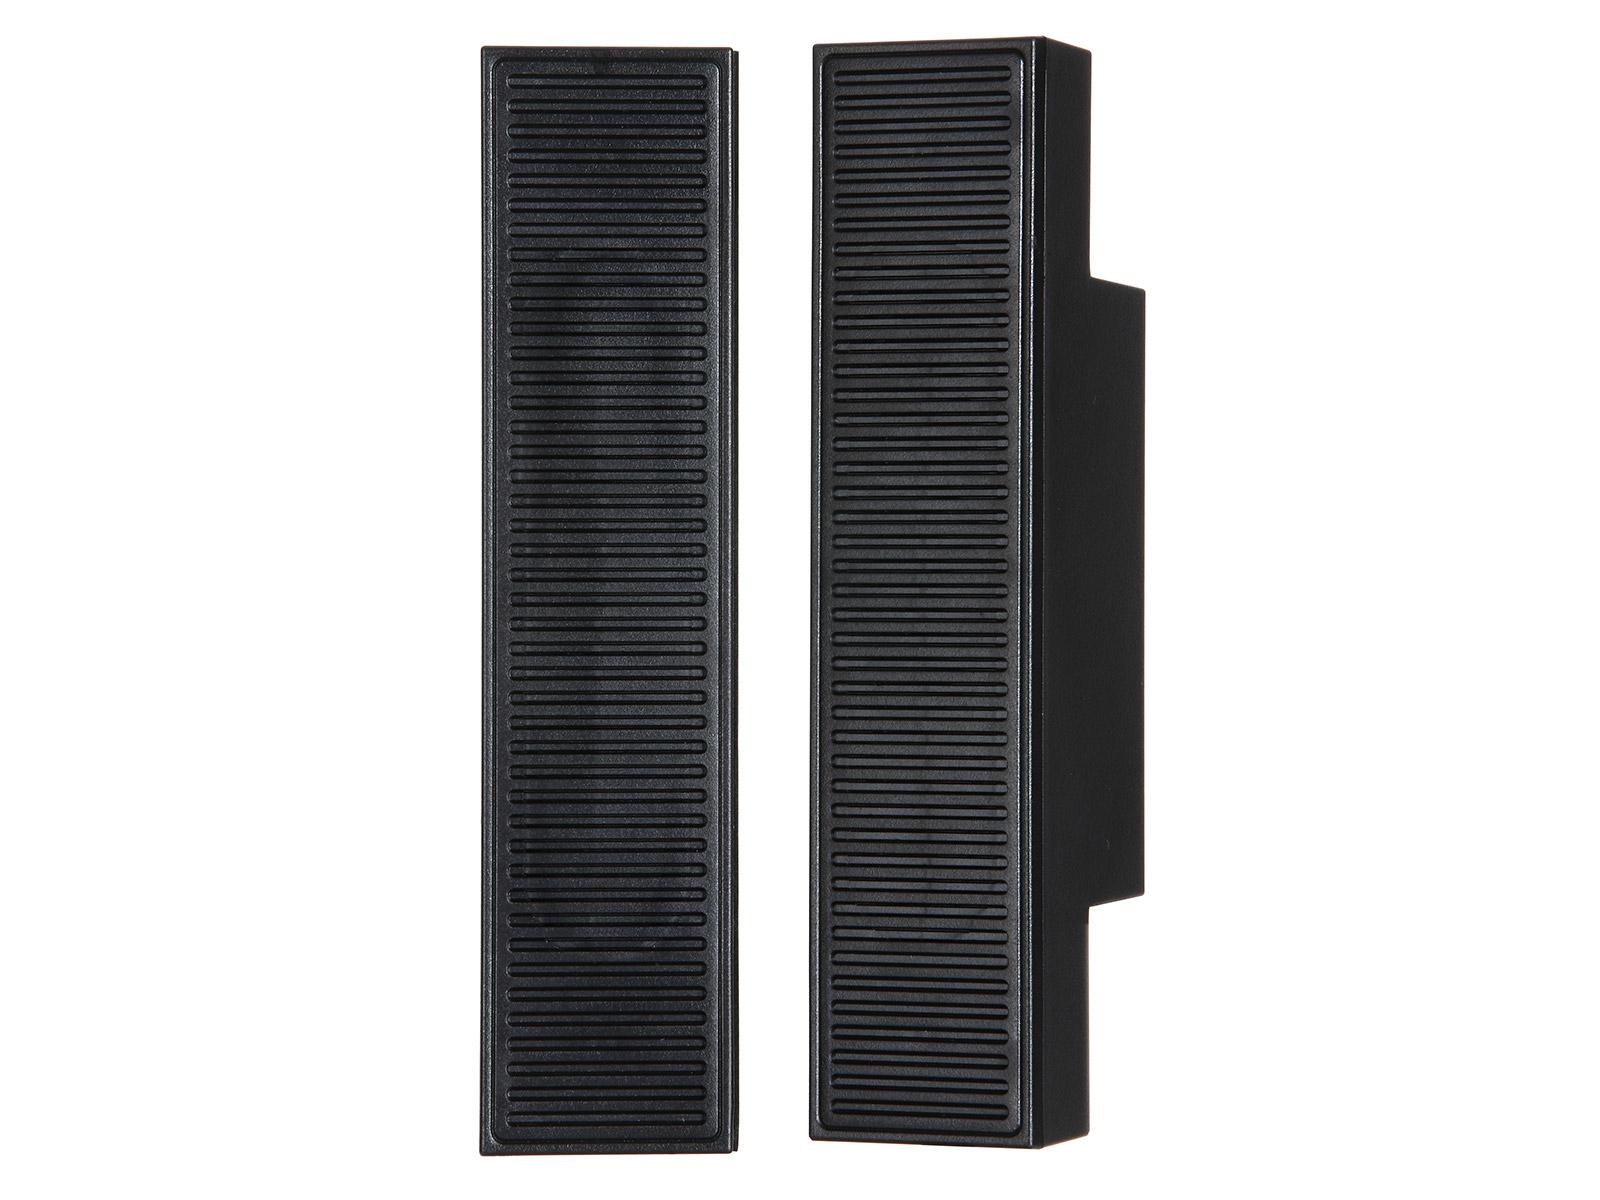 NEC SP-RM2 30W Black loudspeaker